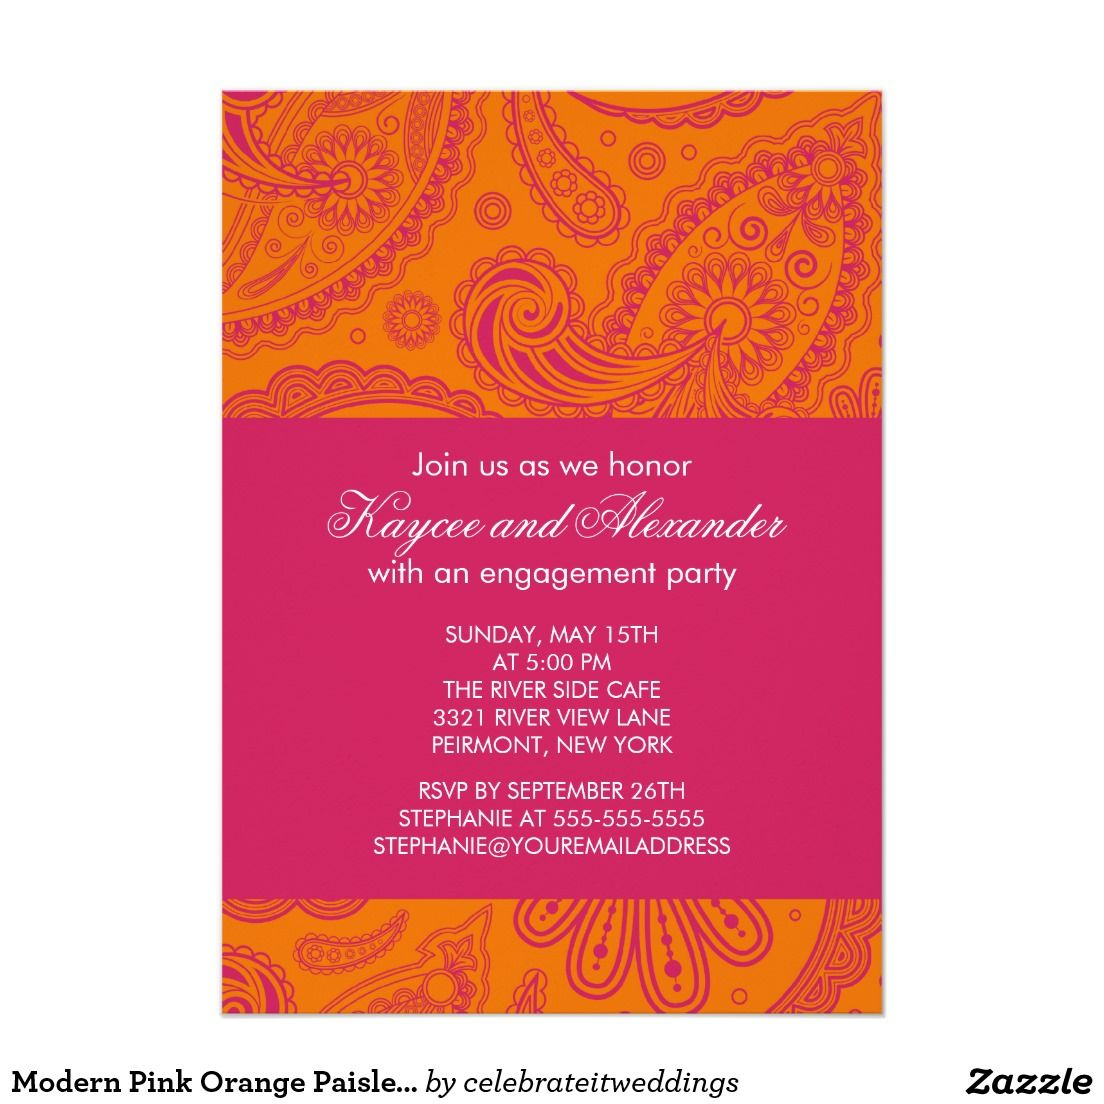 Modern Pink Orange Paisley Engagement Invitations | Wedding ...